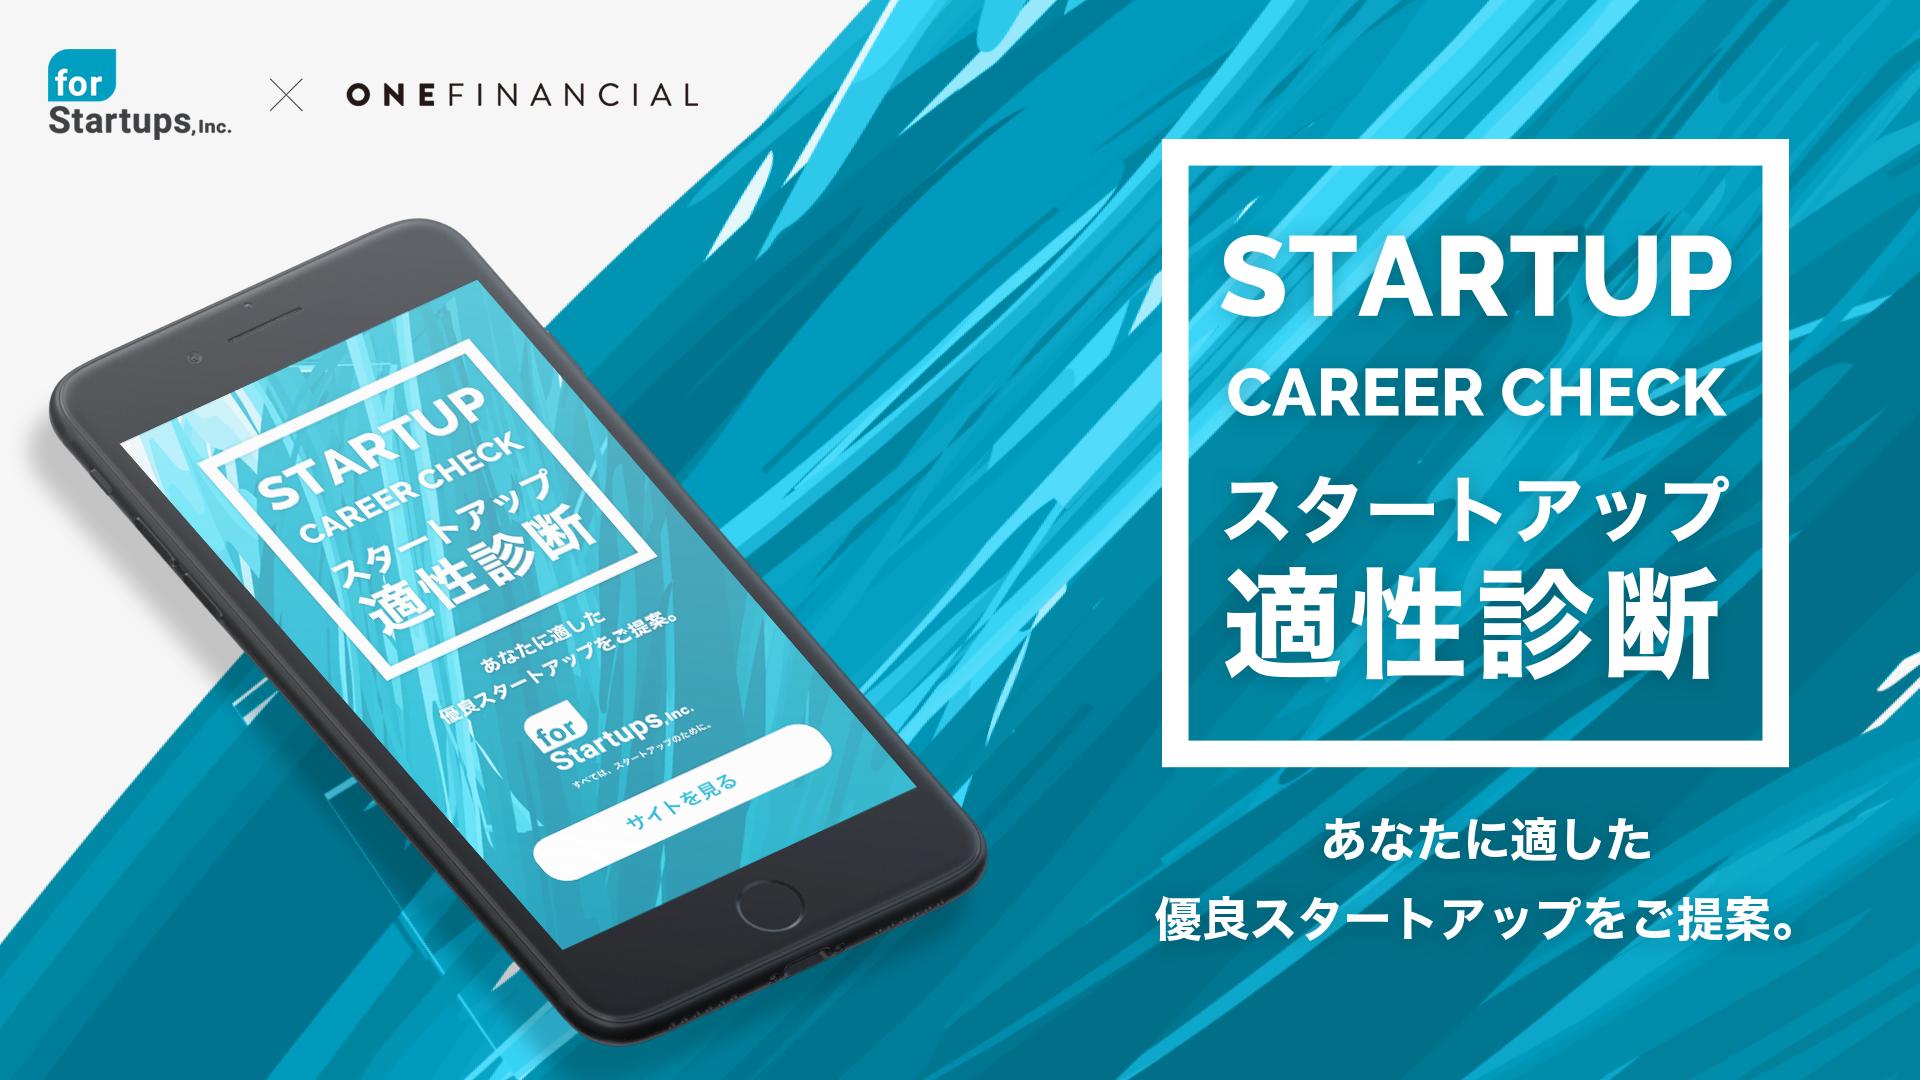 for Startups, Inc.コーポレートロゴ